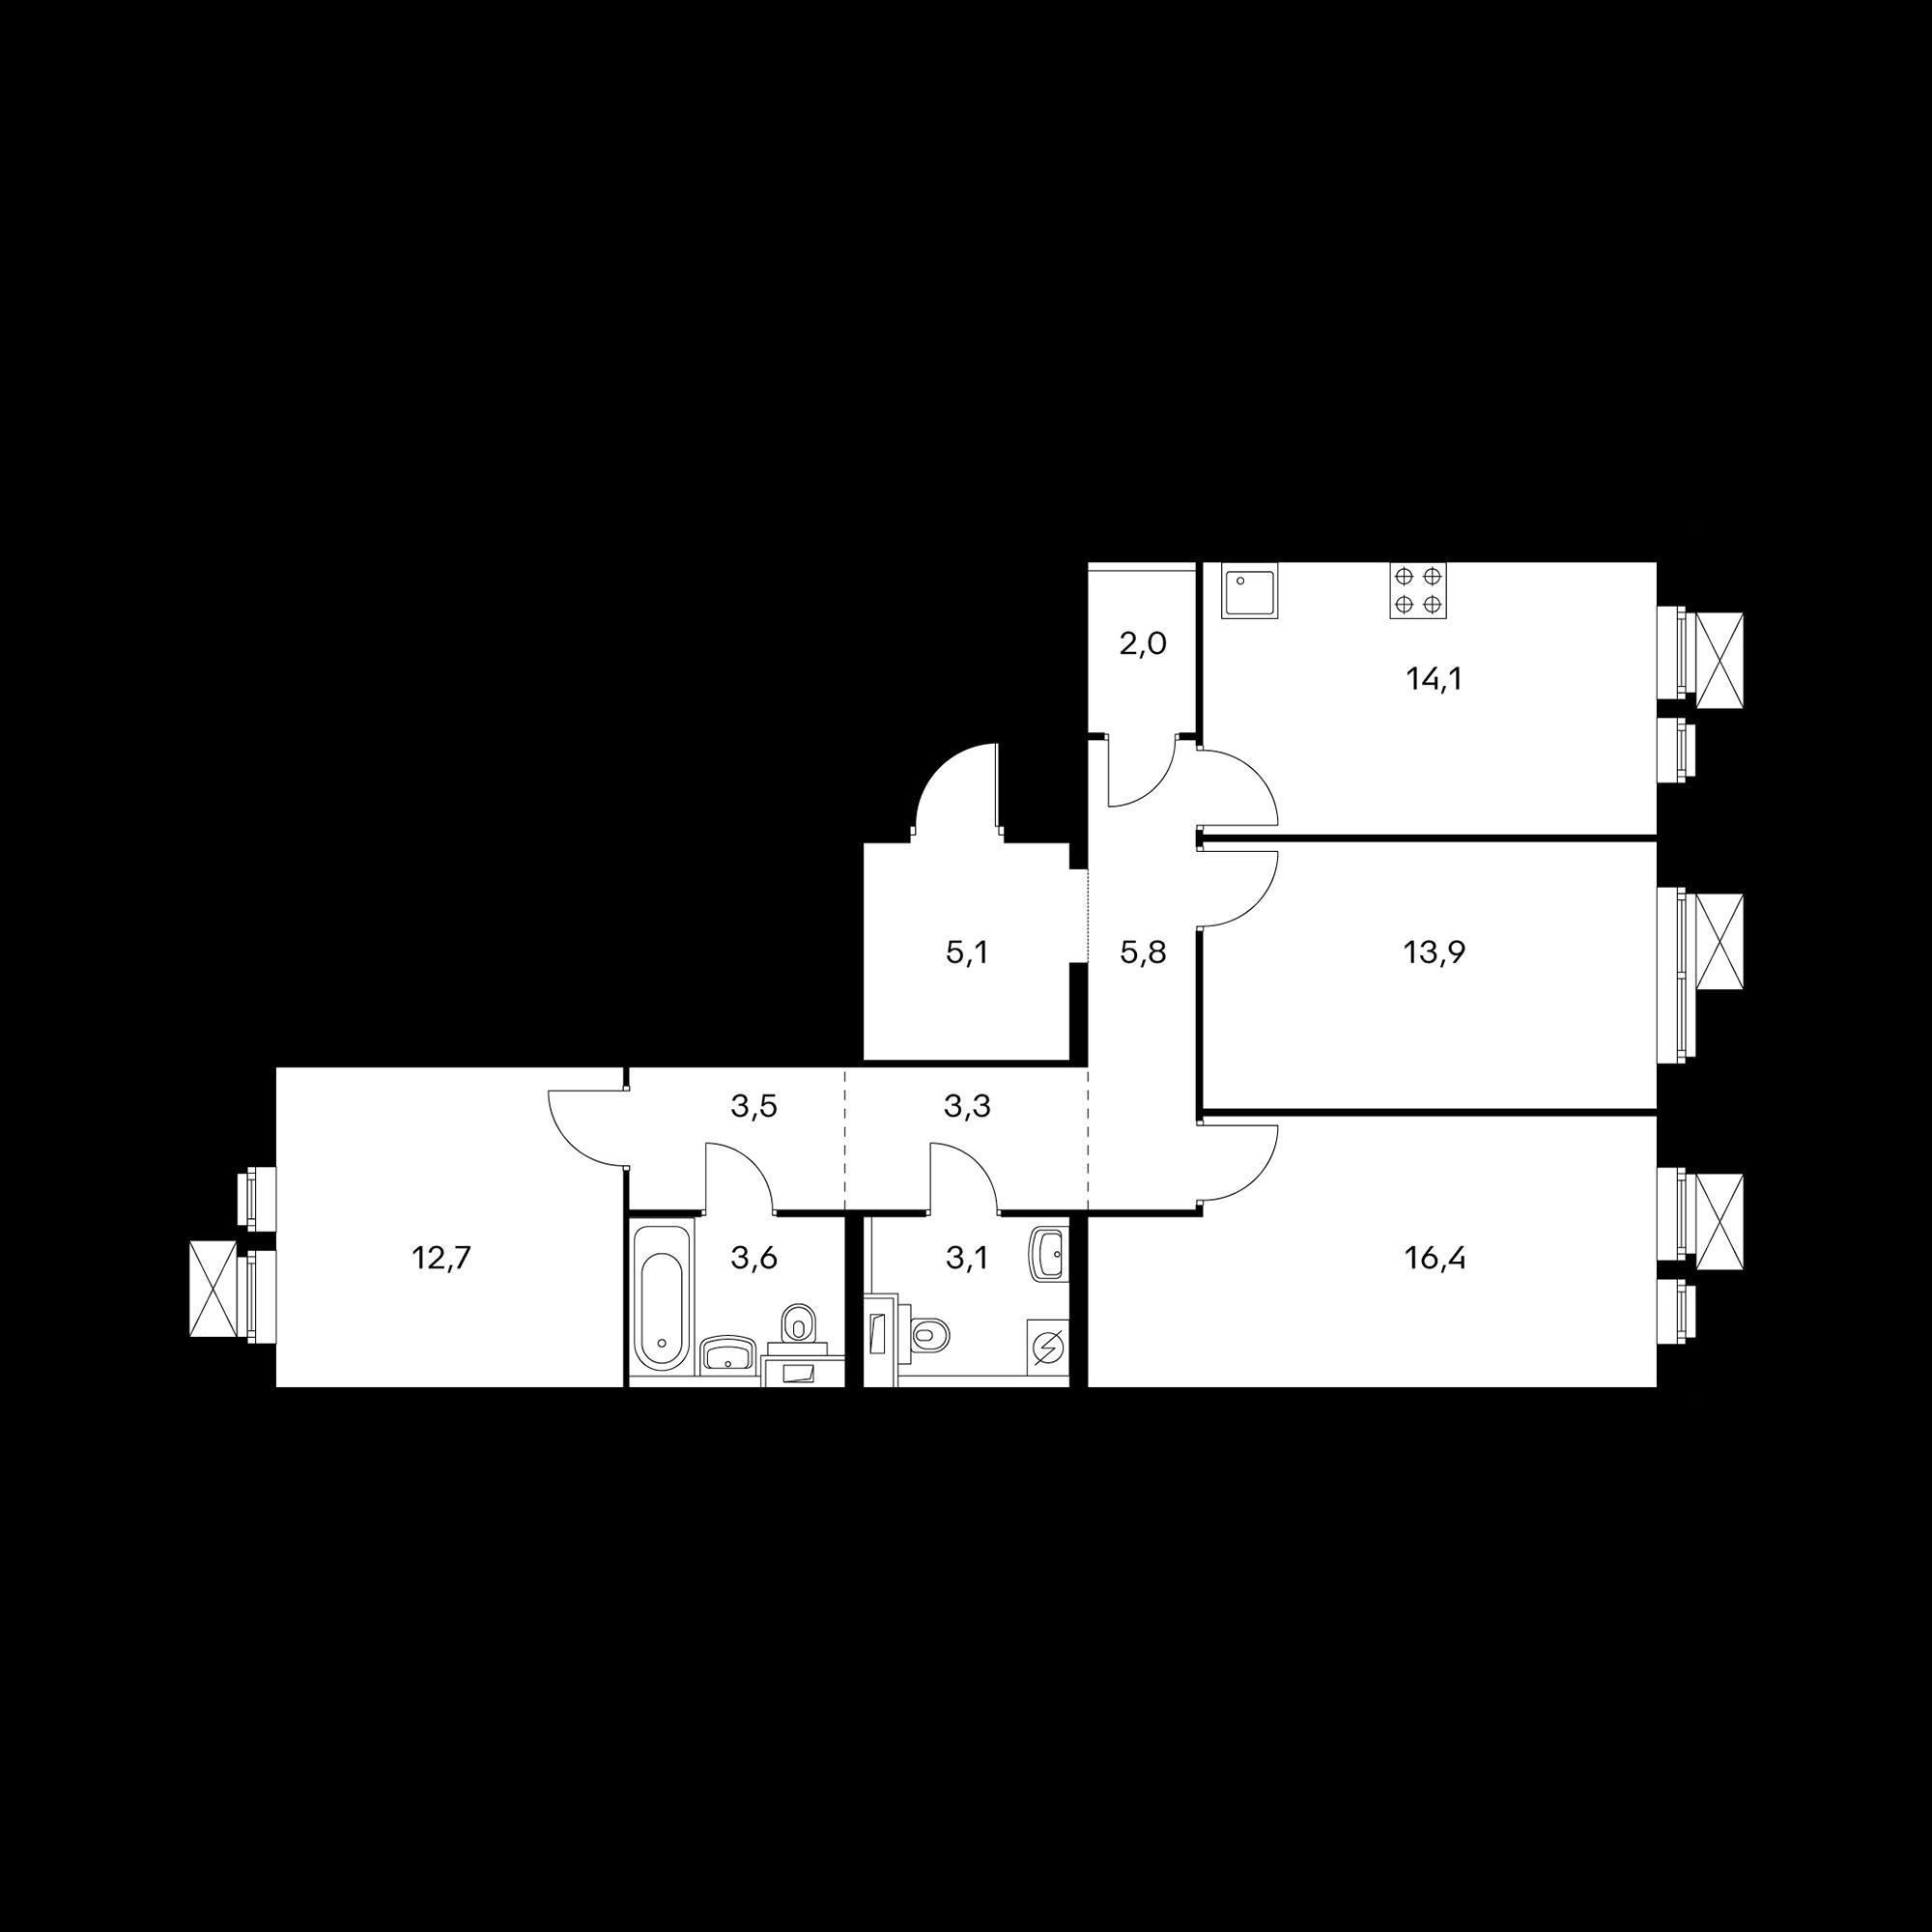 3KL13_9.0-3*